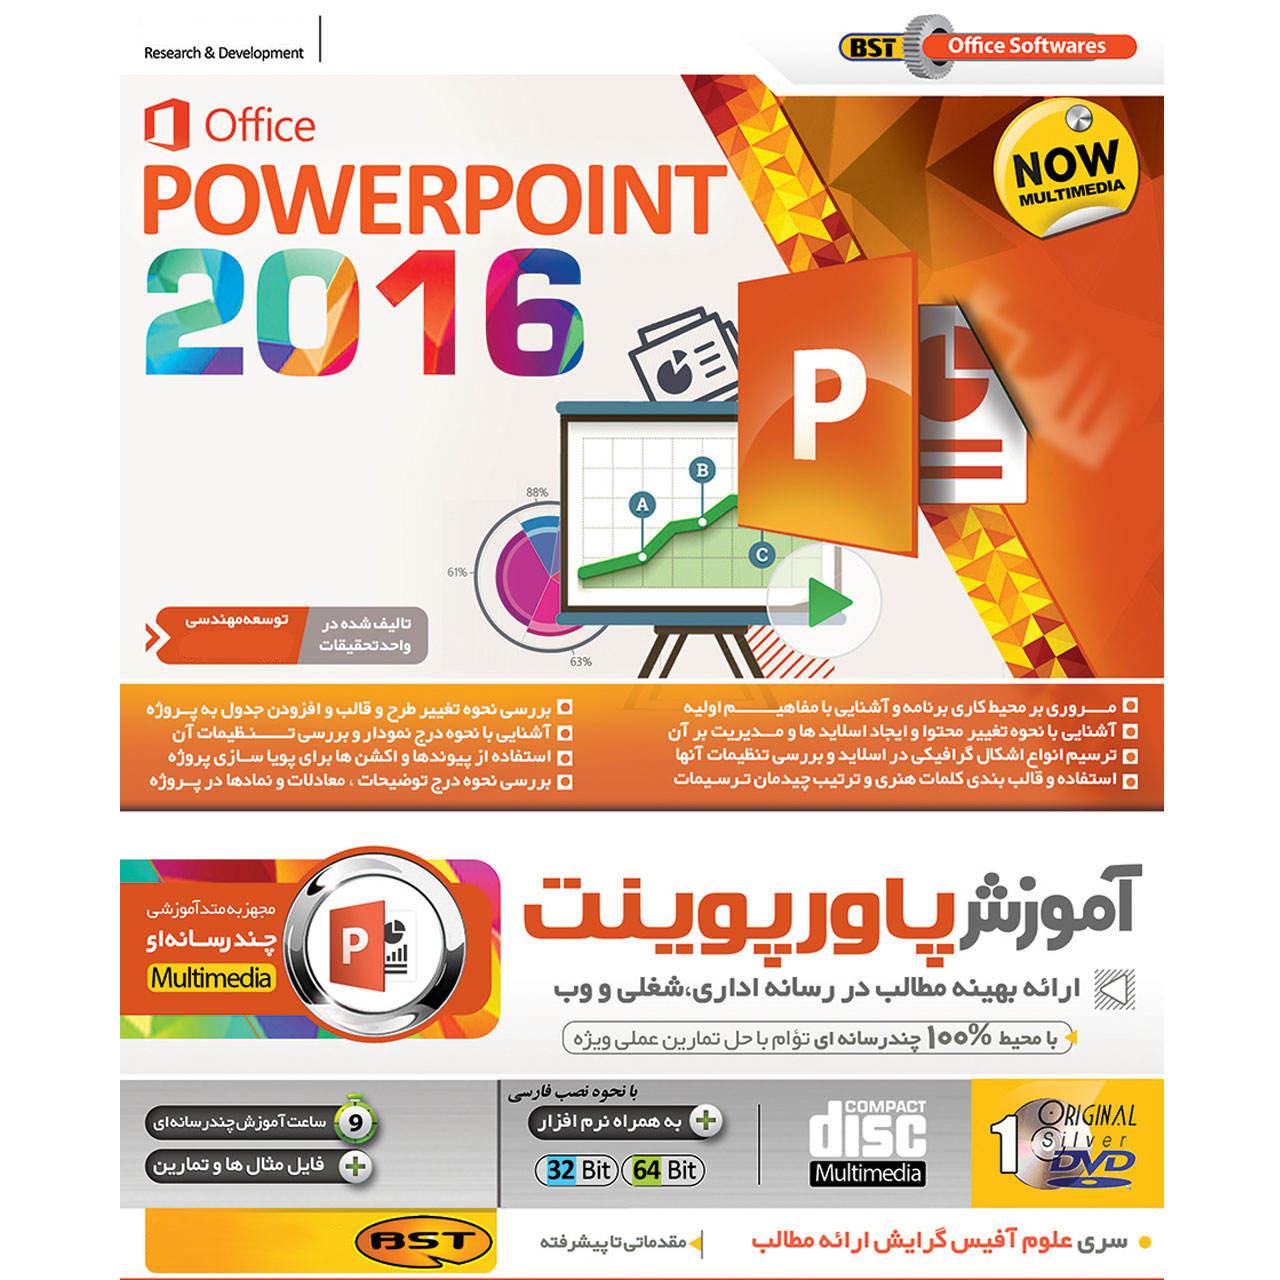 آموزش PowerPoint 2016 نشر بهکامان